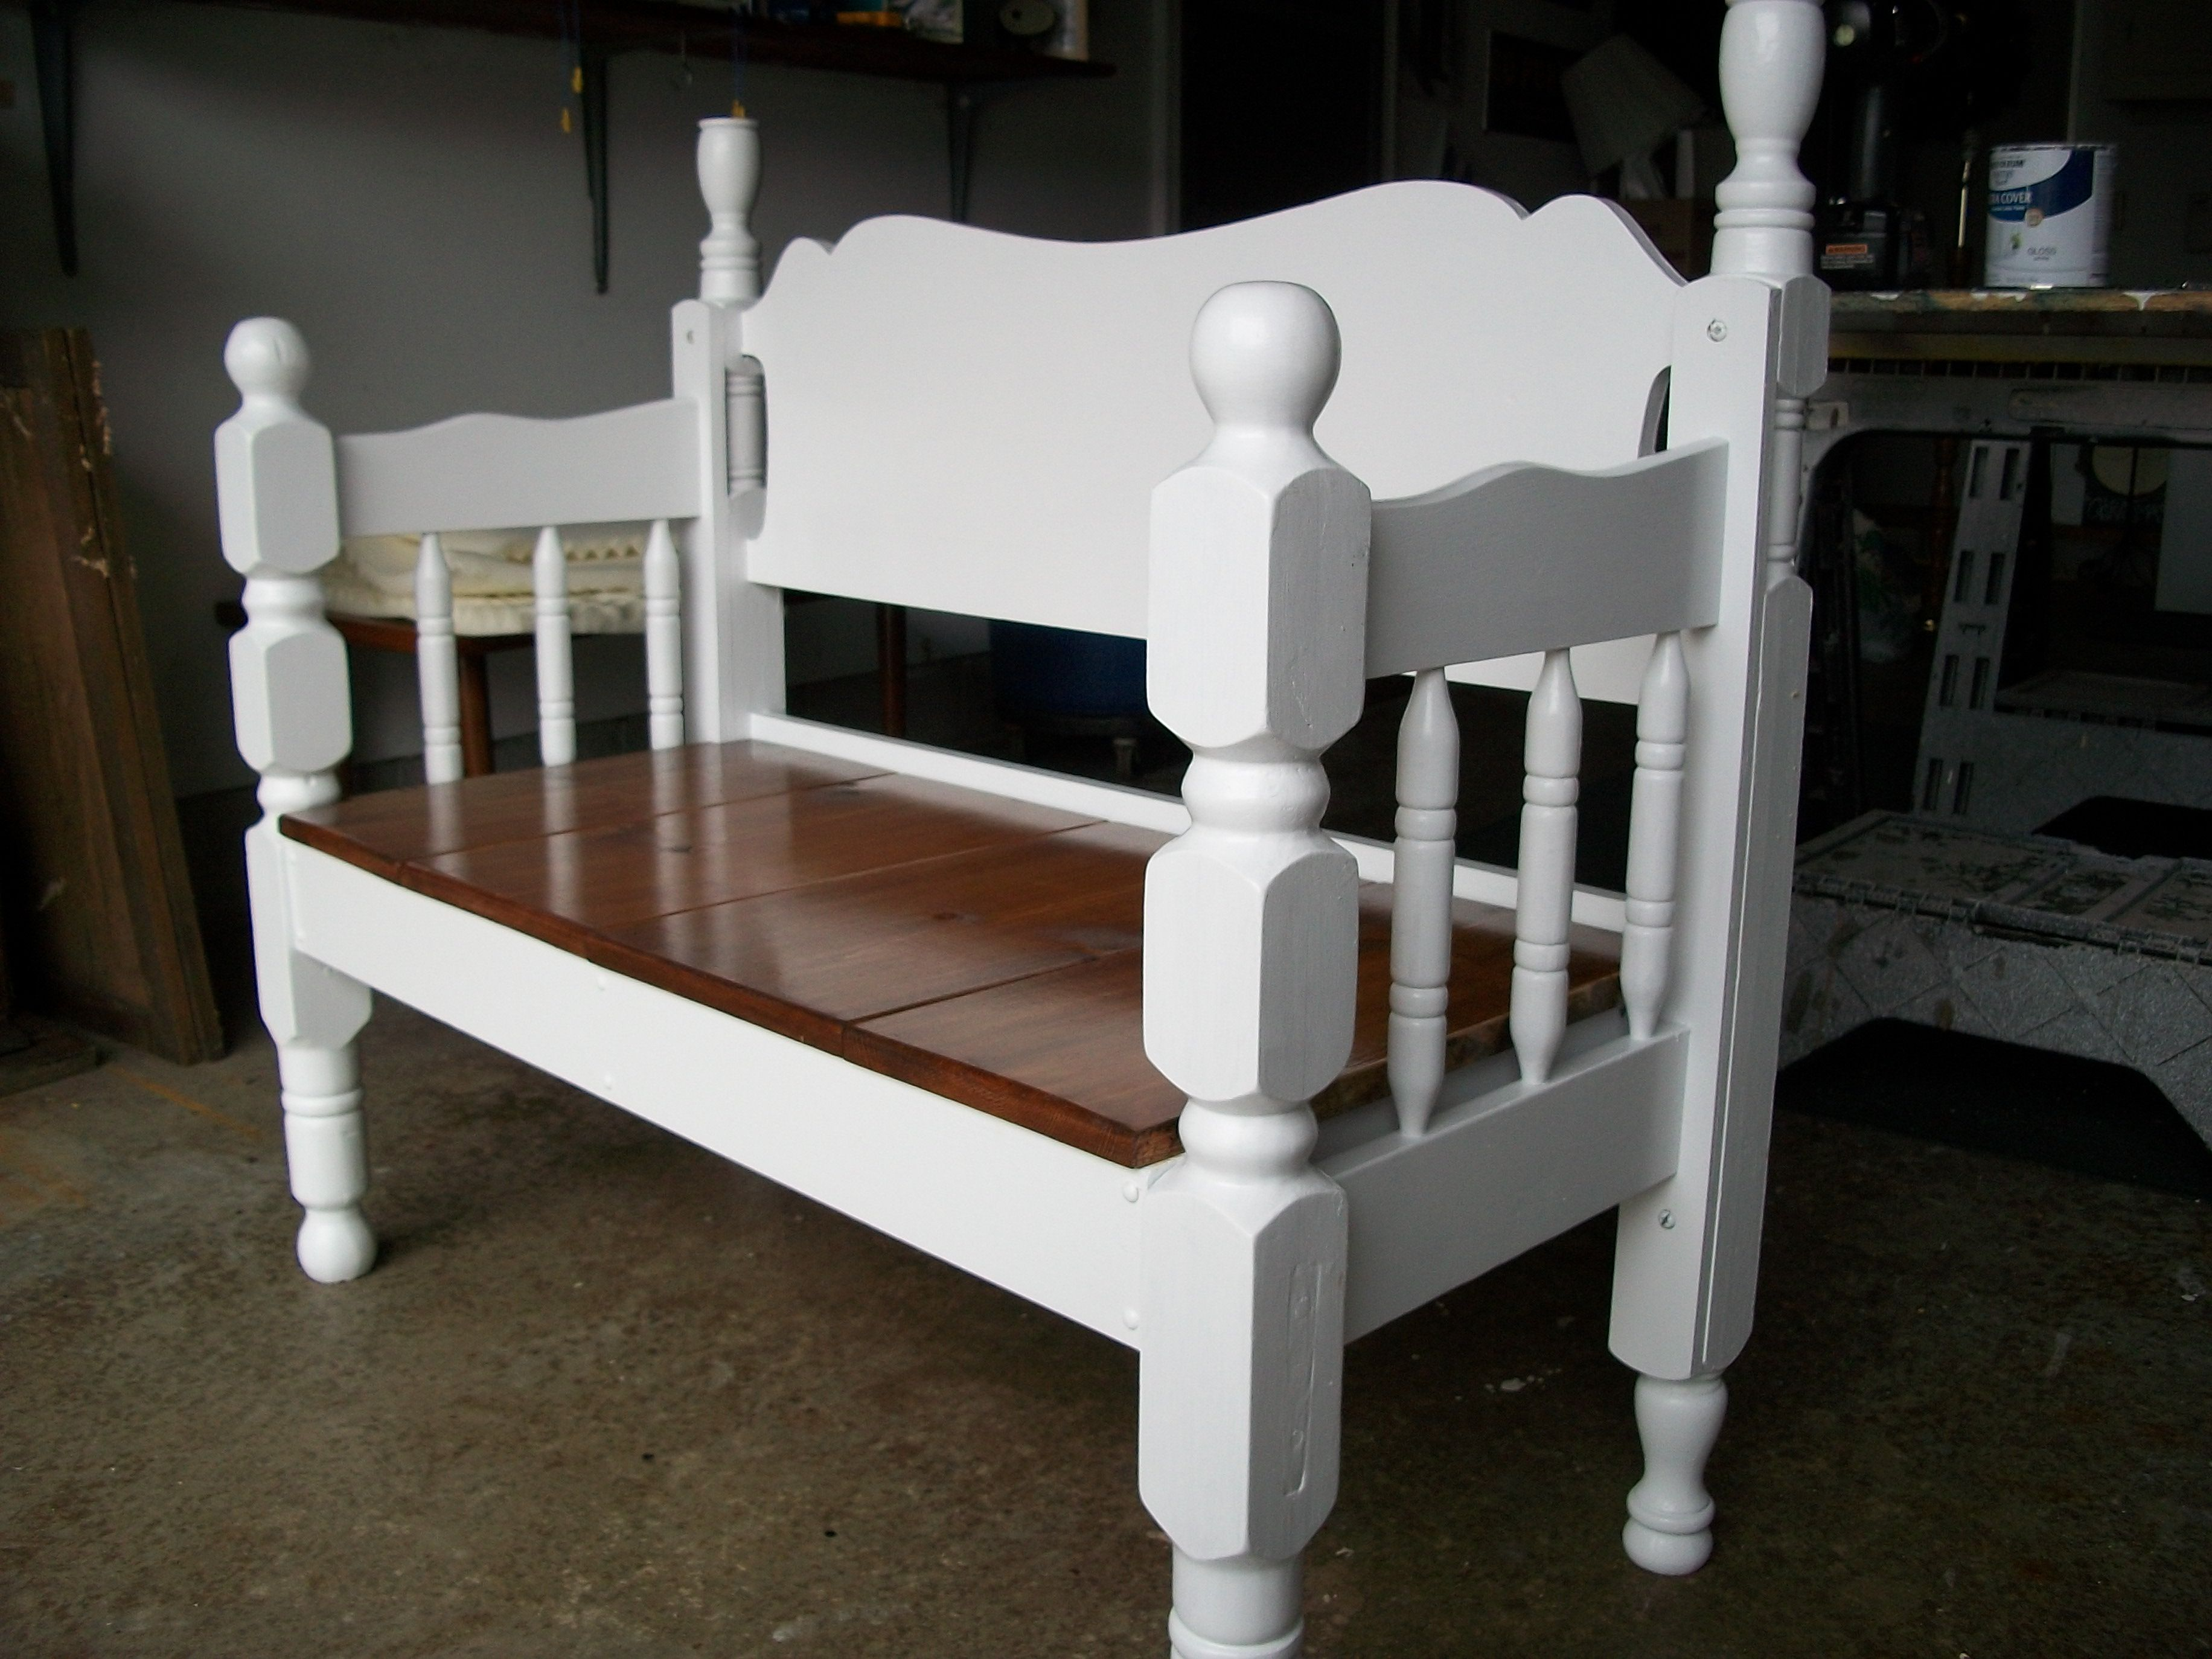 Headboard bench For the Home Pinterest Headboard